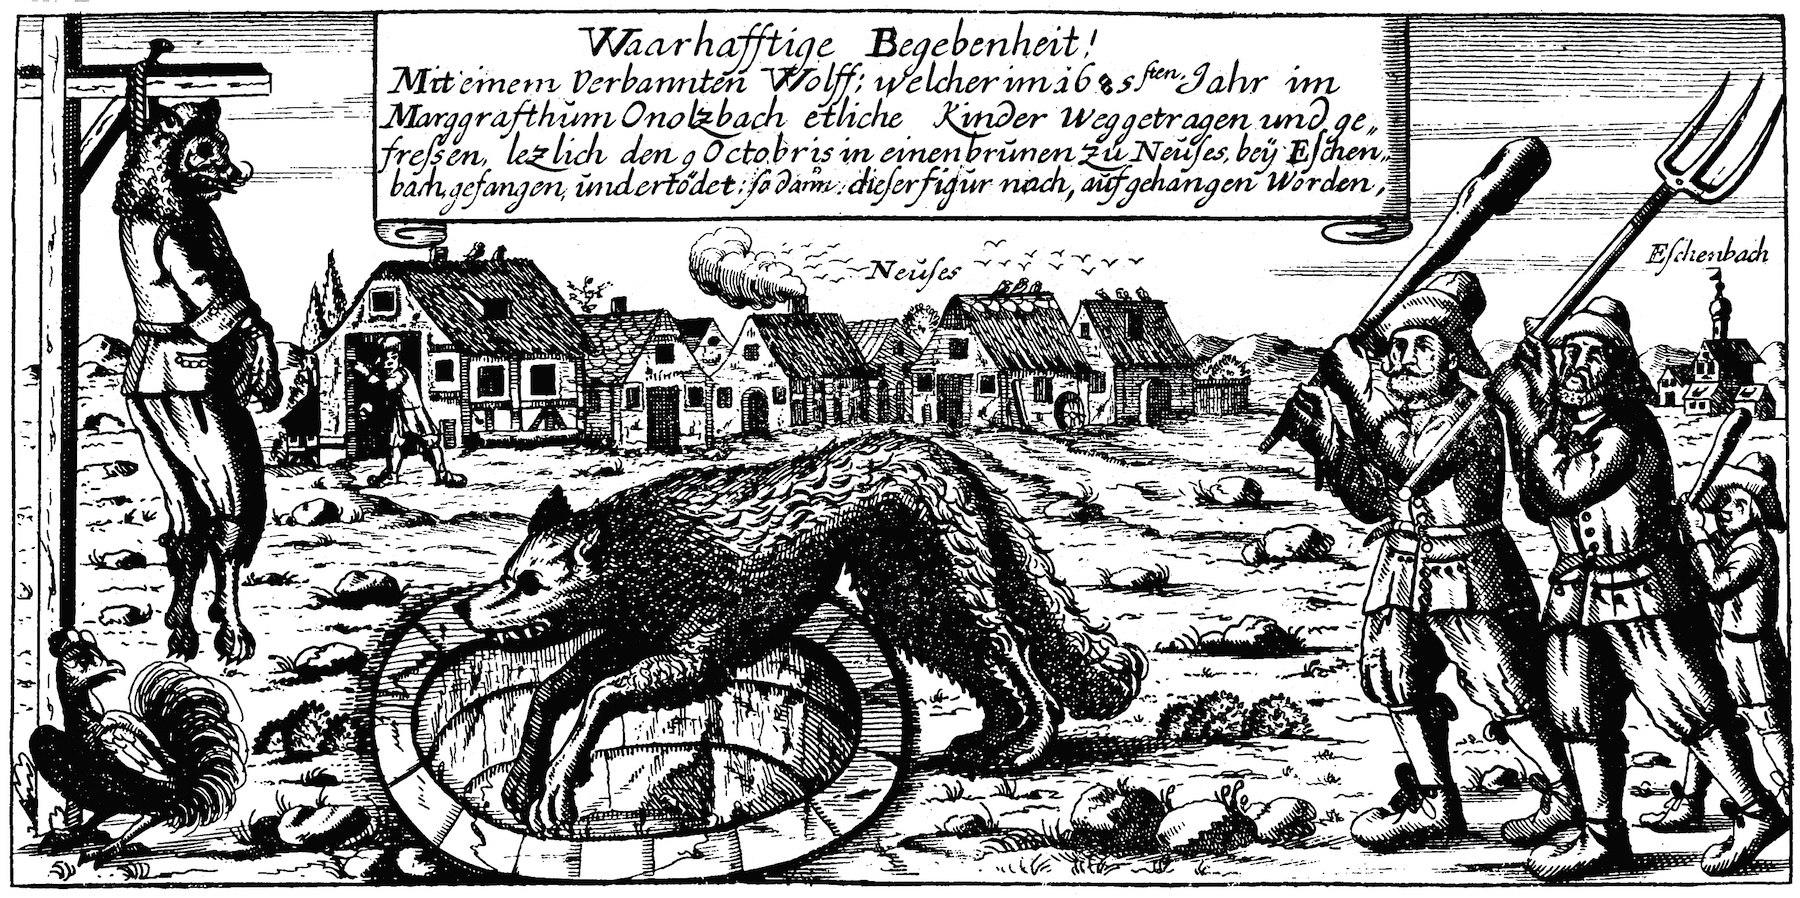 The Wolf Eschenbach